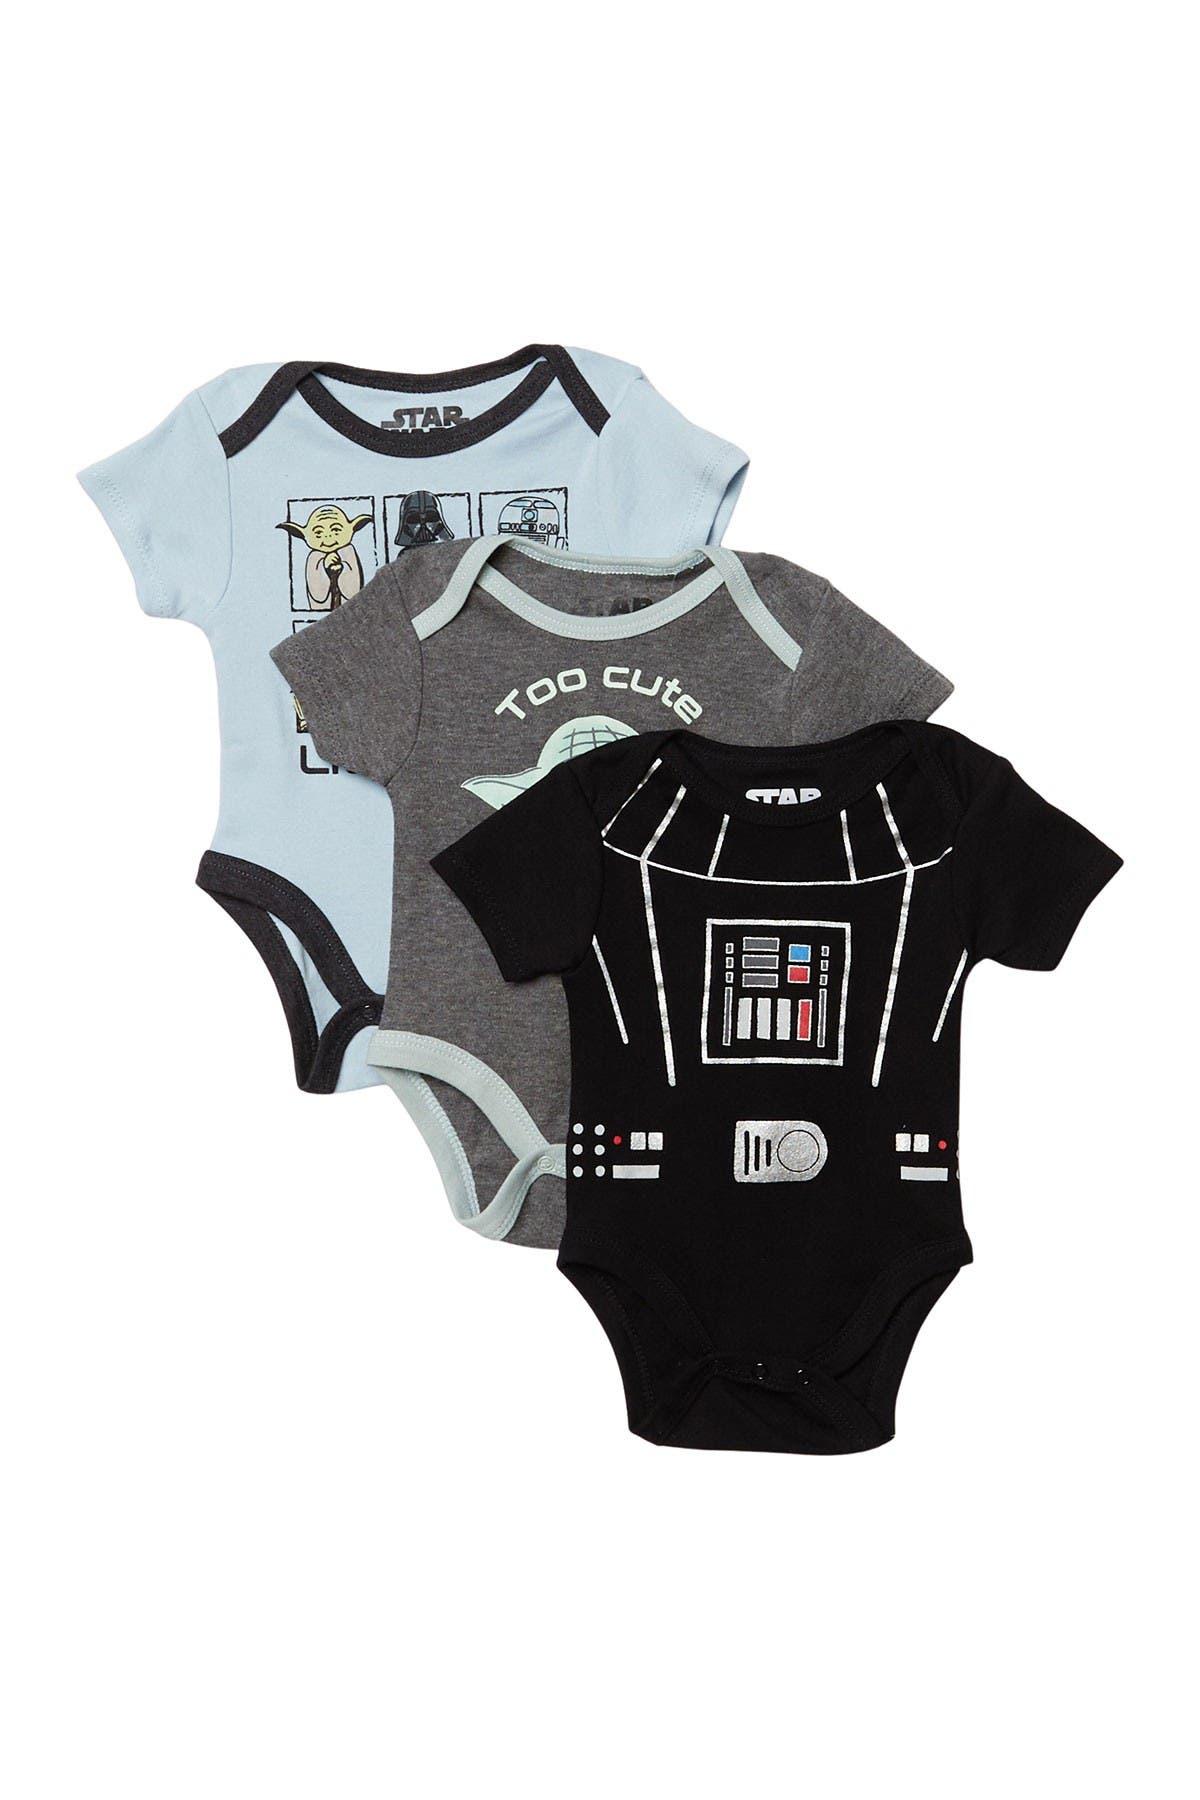 Image of HAPPY THREADS Star Wars Bodysuits - Set of 3